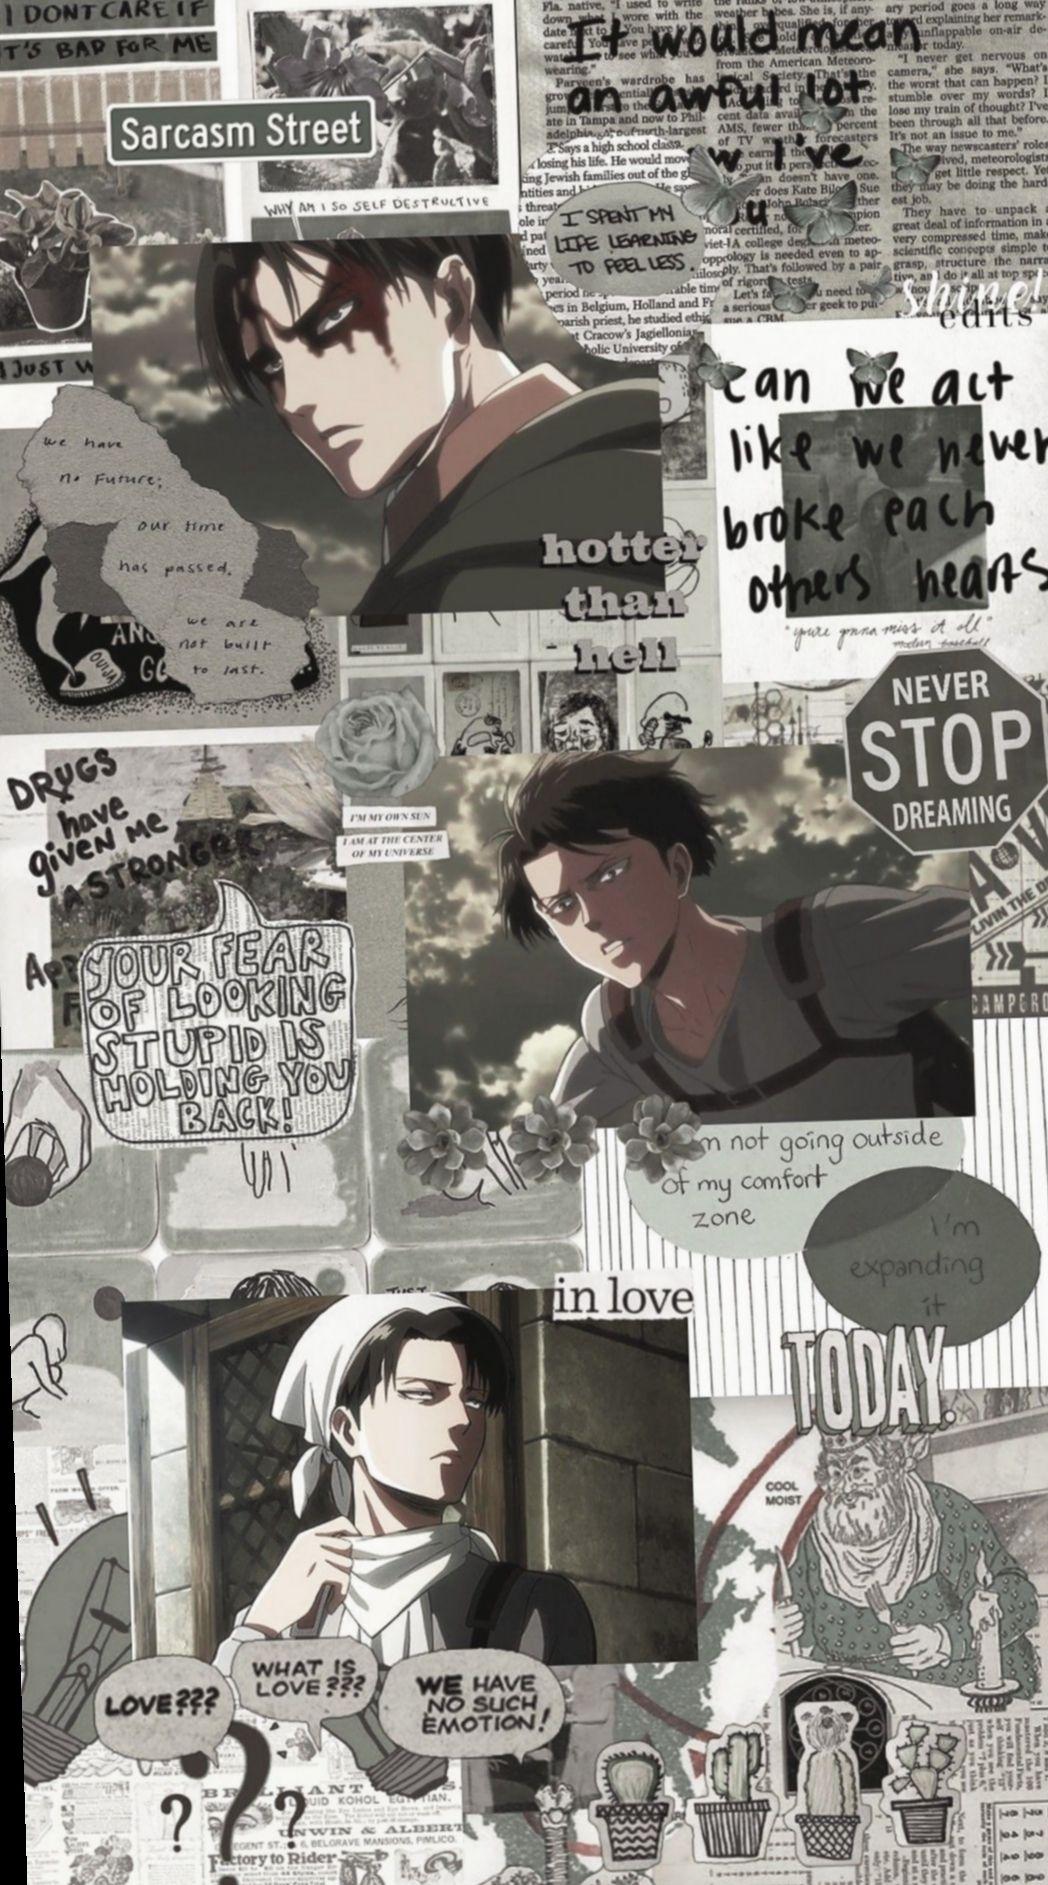 Aesthetic Anime Wallpapers Aot - Anime Wallpaper HD